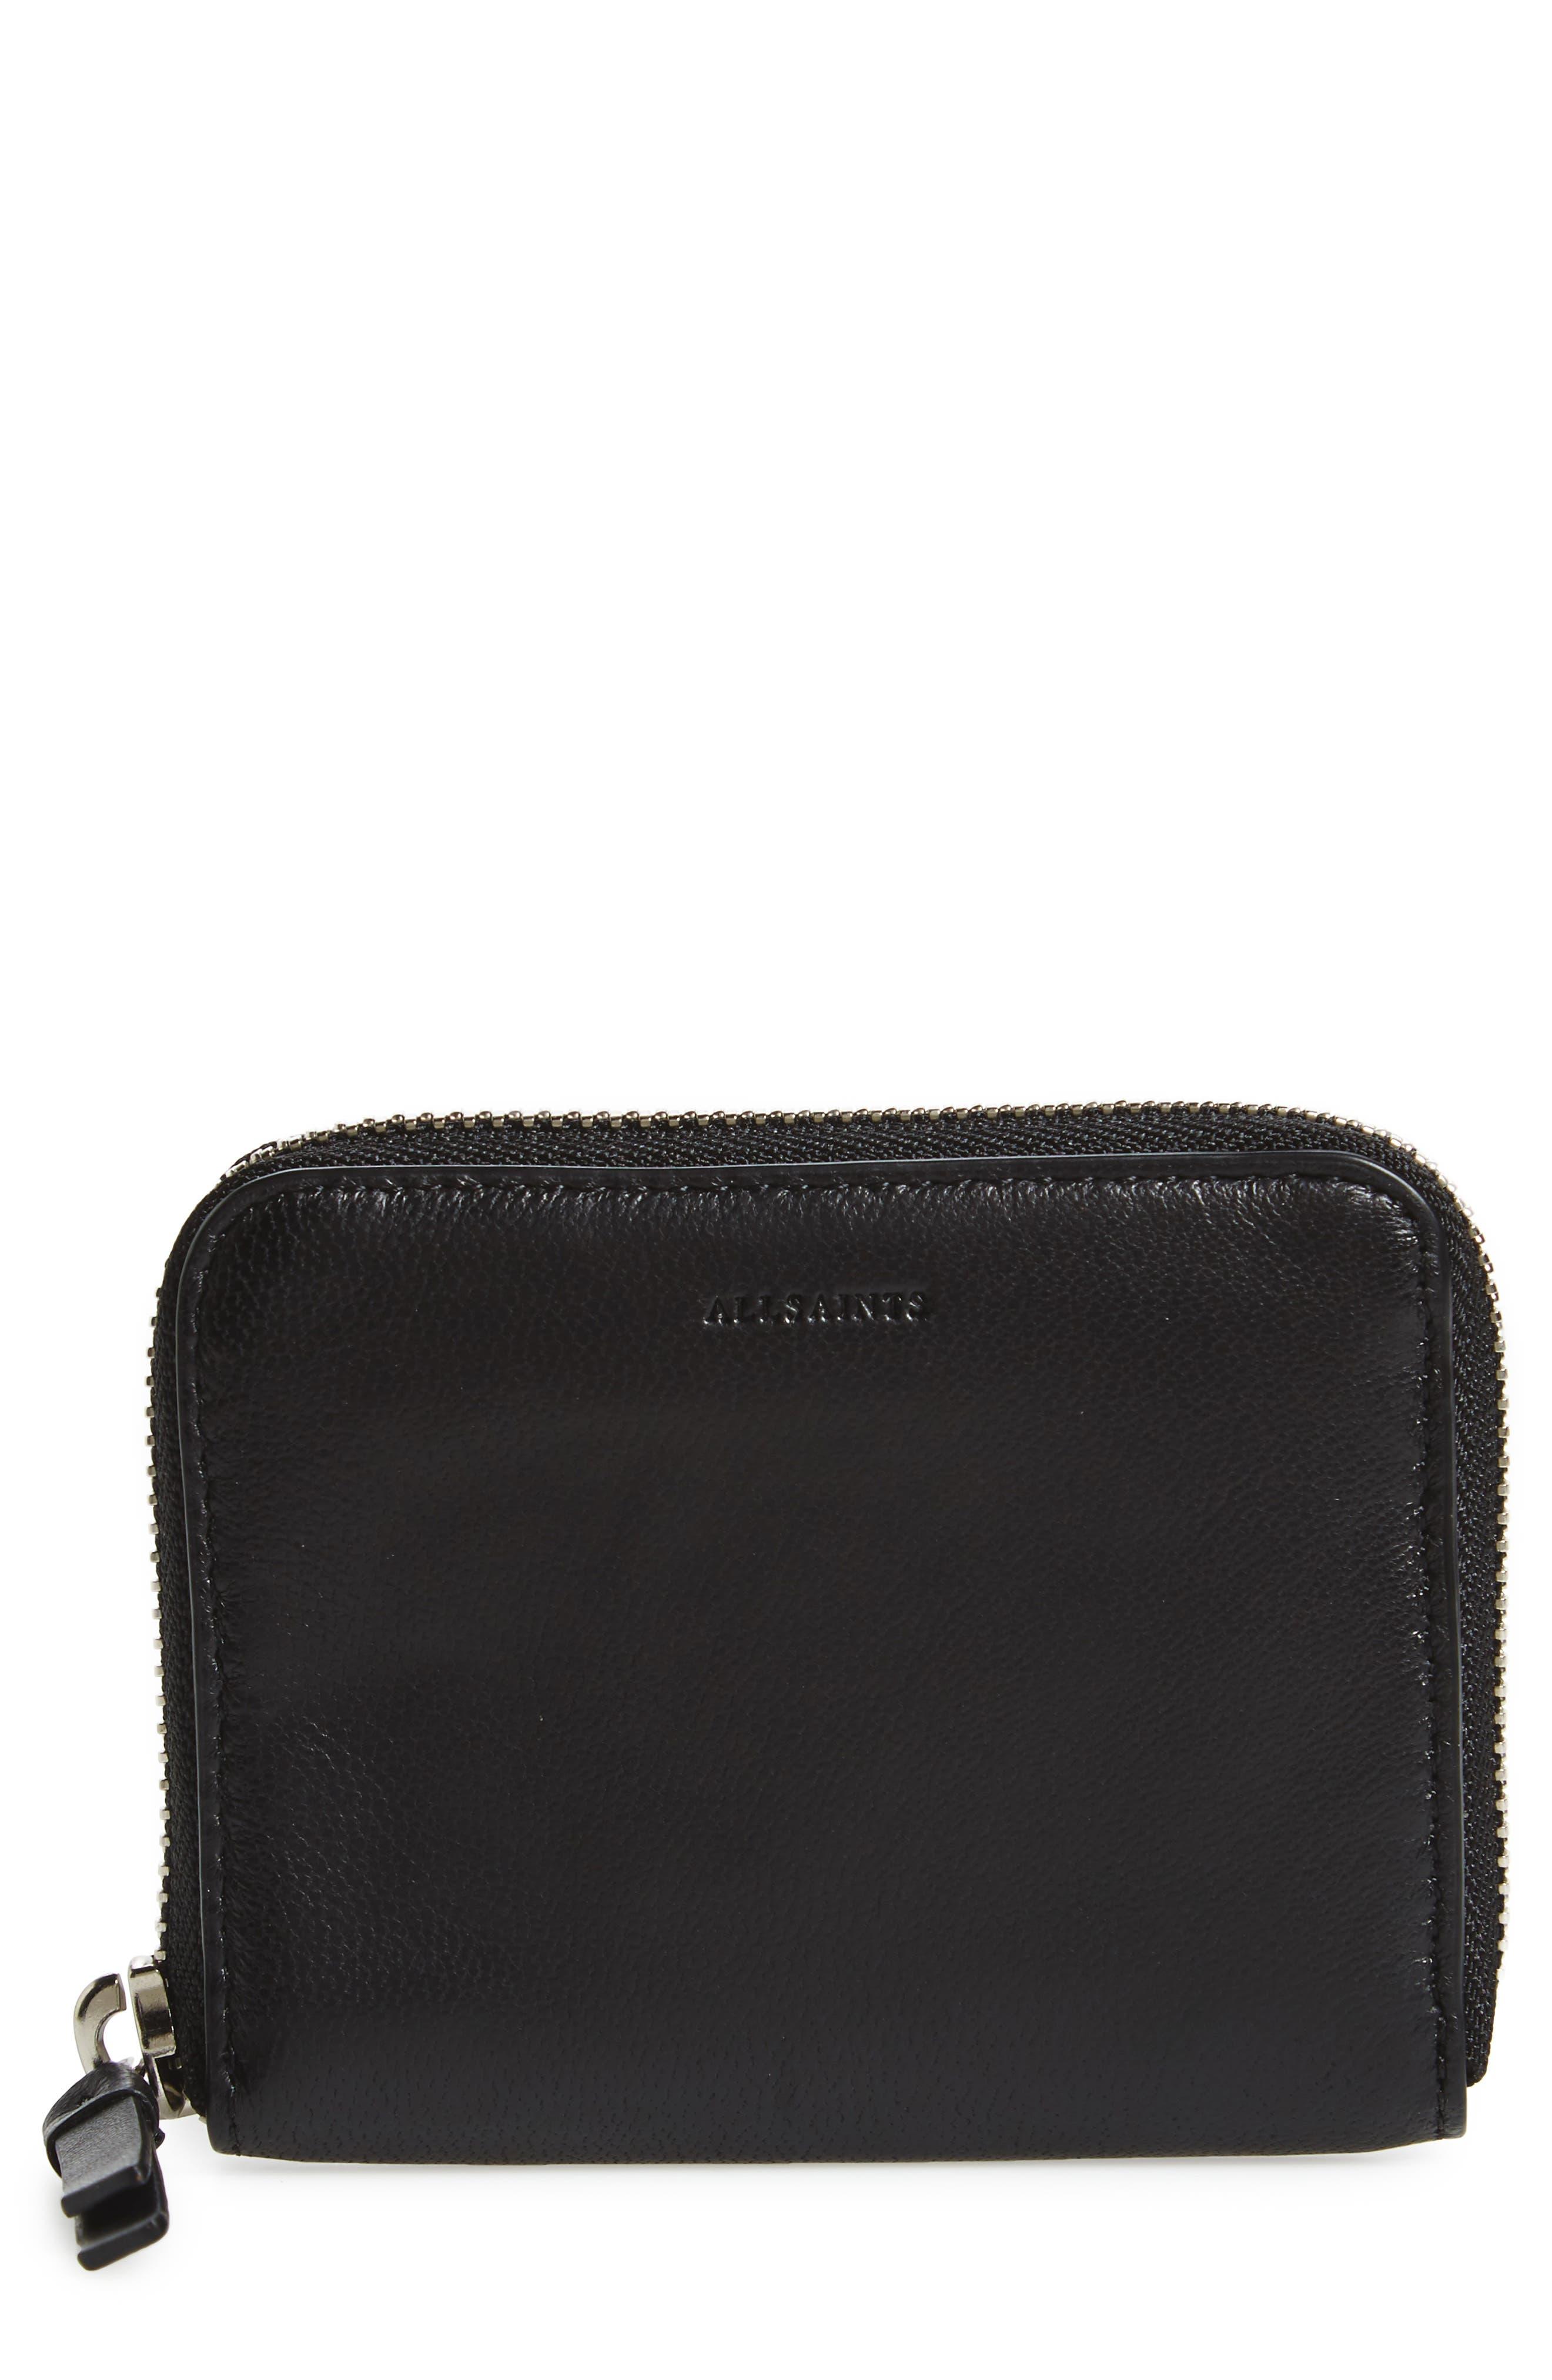 Kanda Mini Zip Wallet,                         Main,                         color, 001